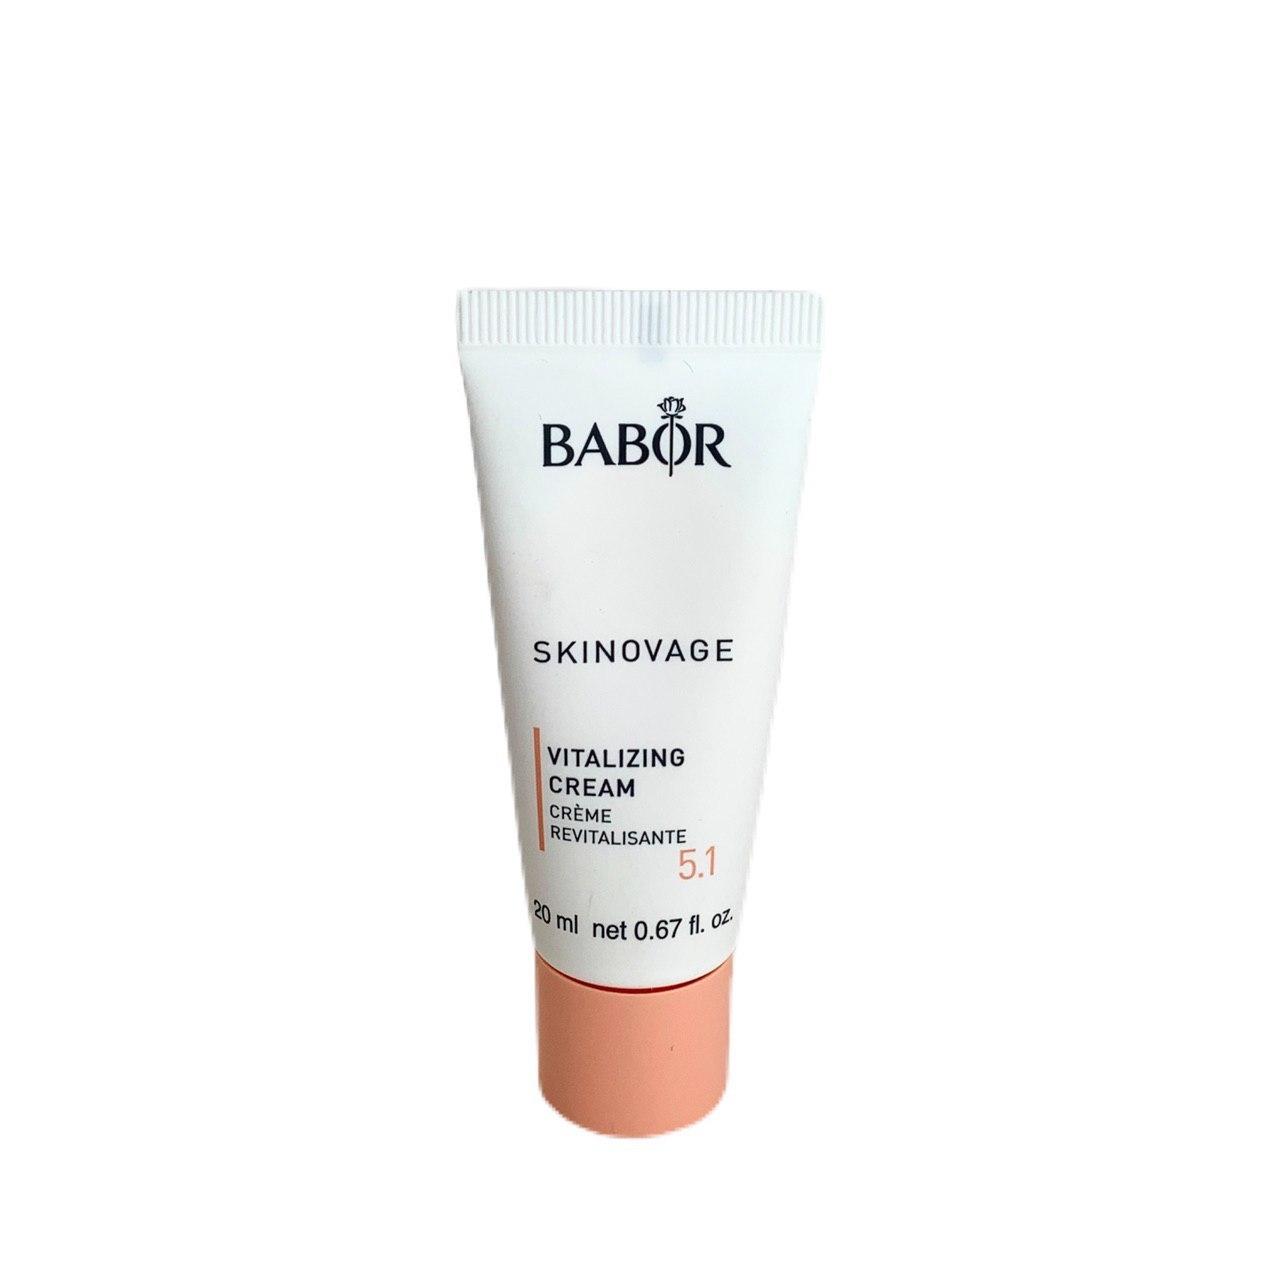 Крем для лица Babor Skinovage Vitalizing Cream 5.1 MINI 20 мл